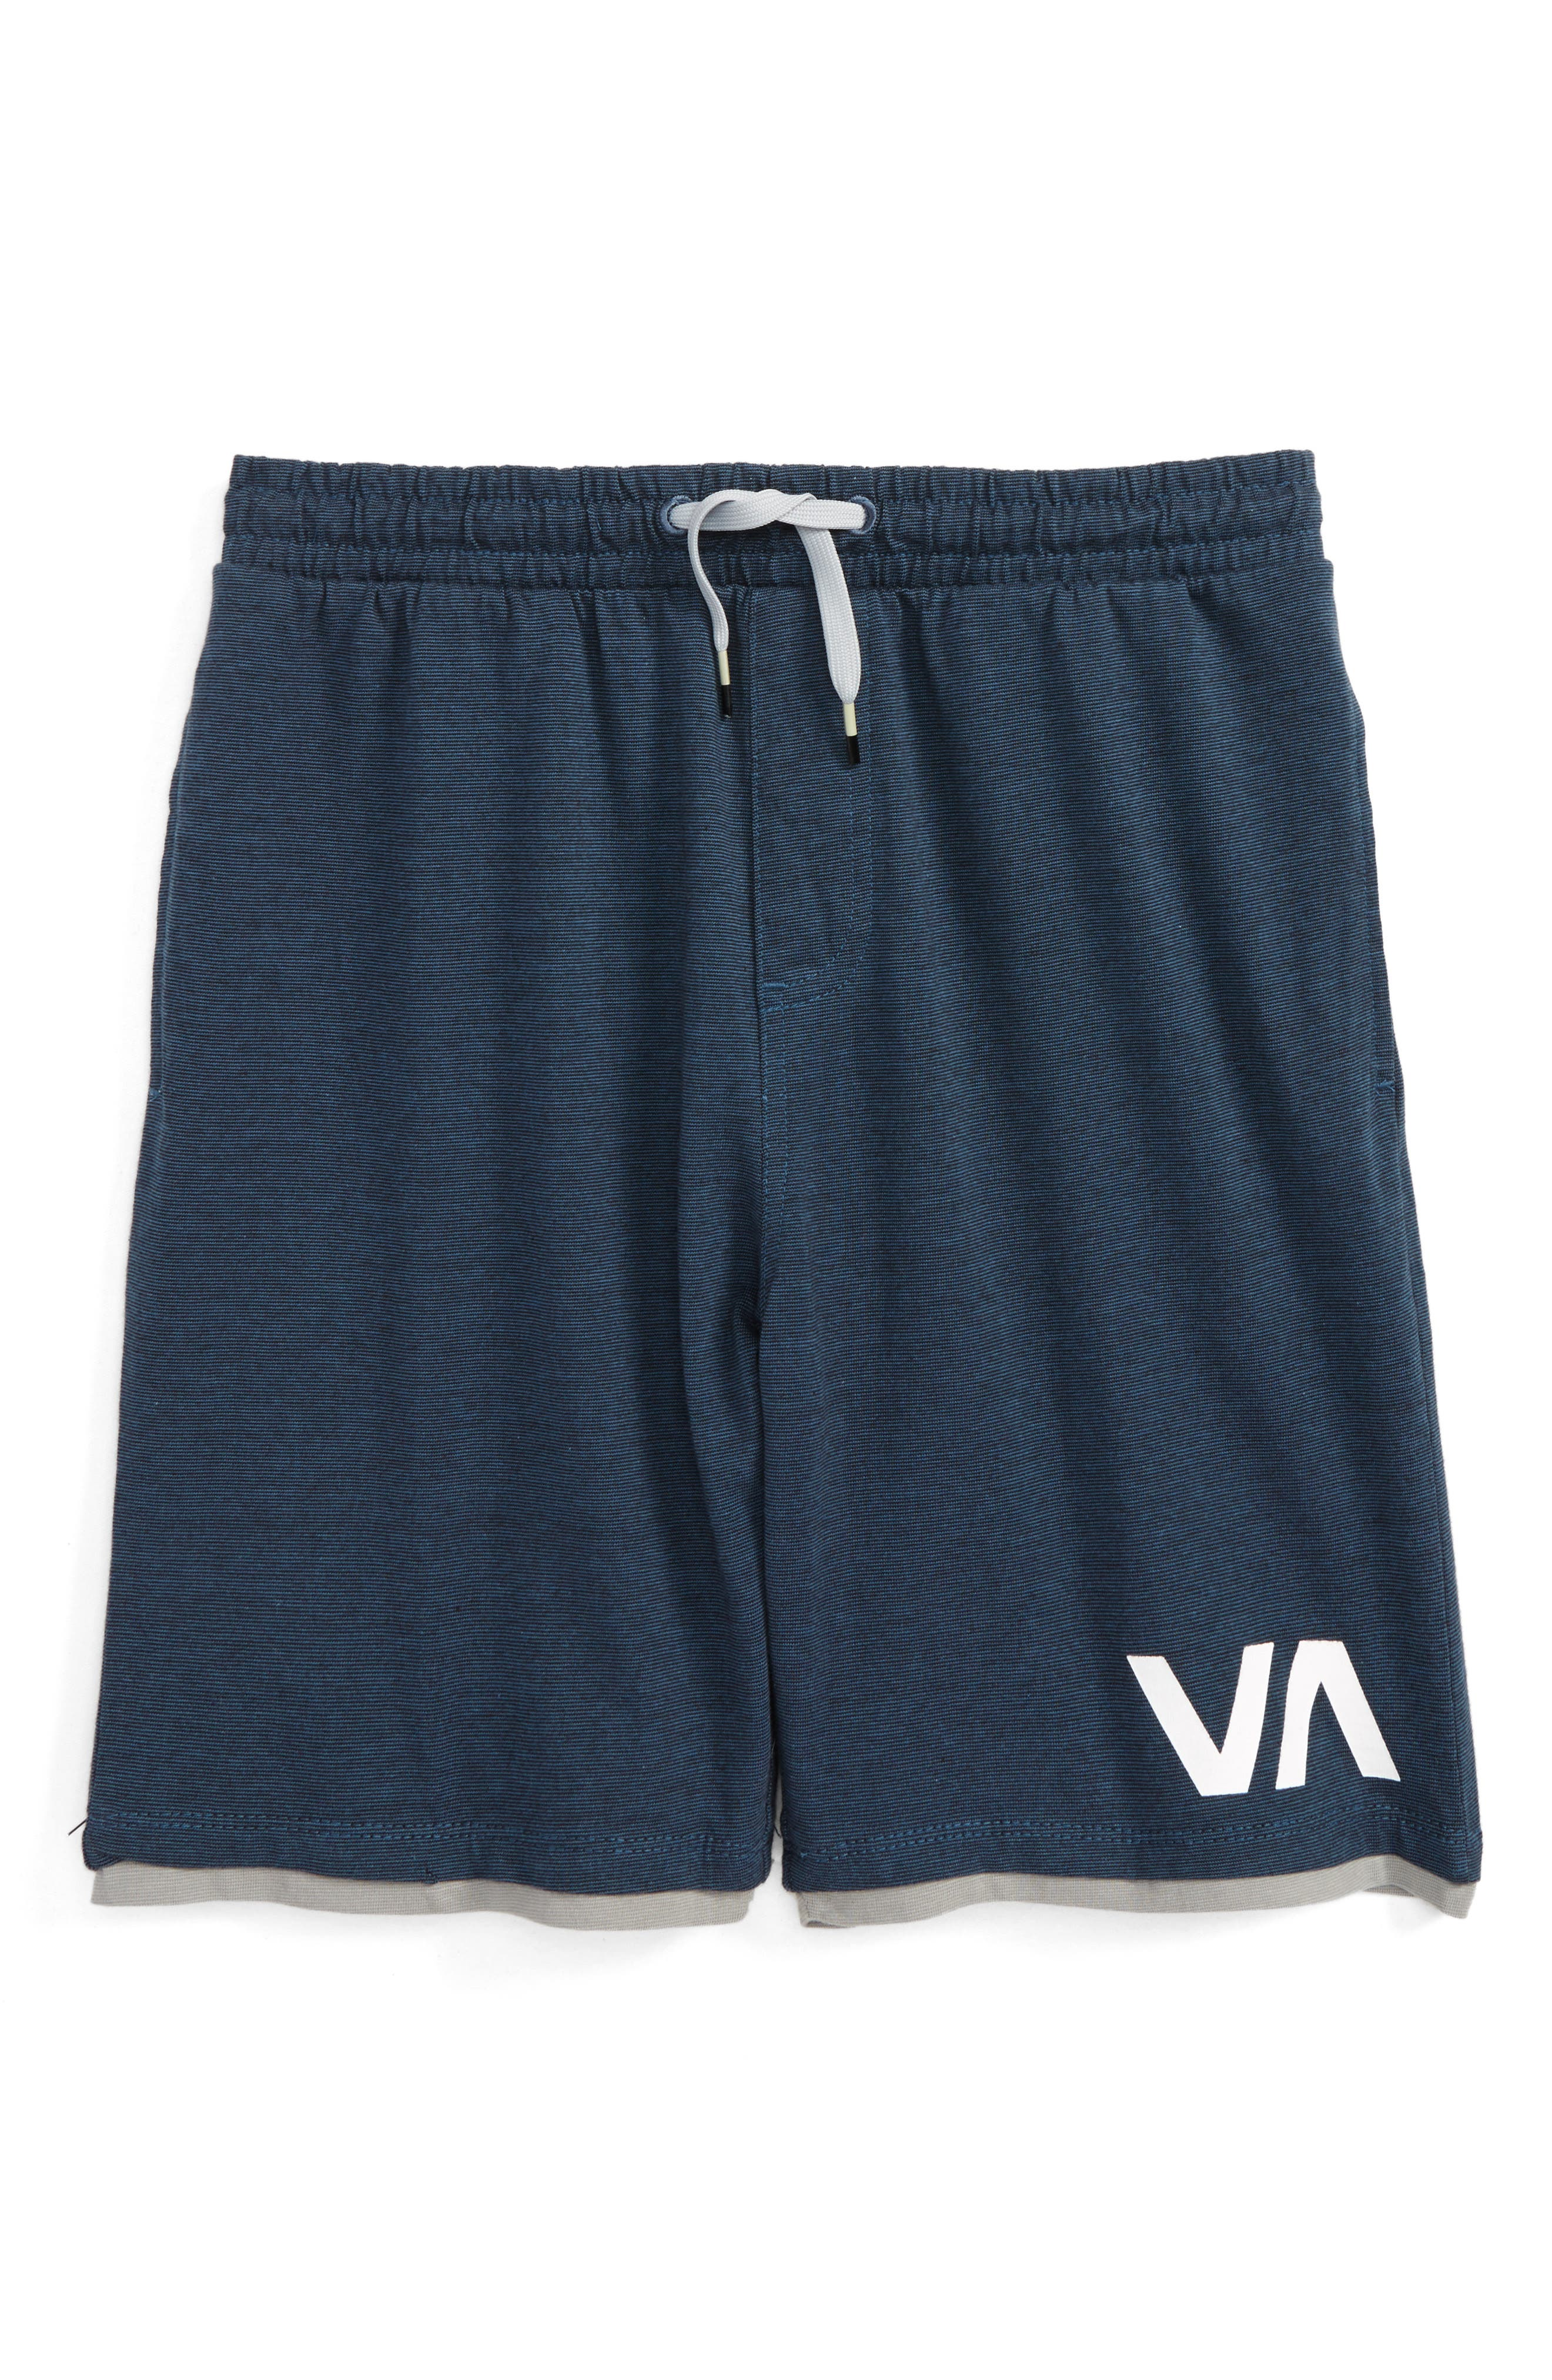 Layers II Shorts,                         Main,                         color, Desert Blue